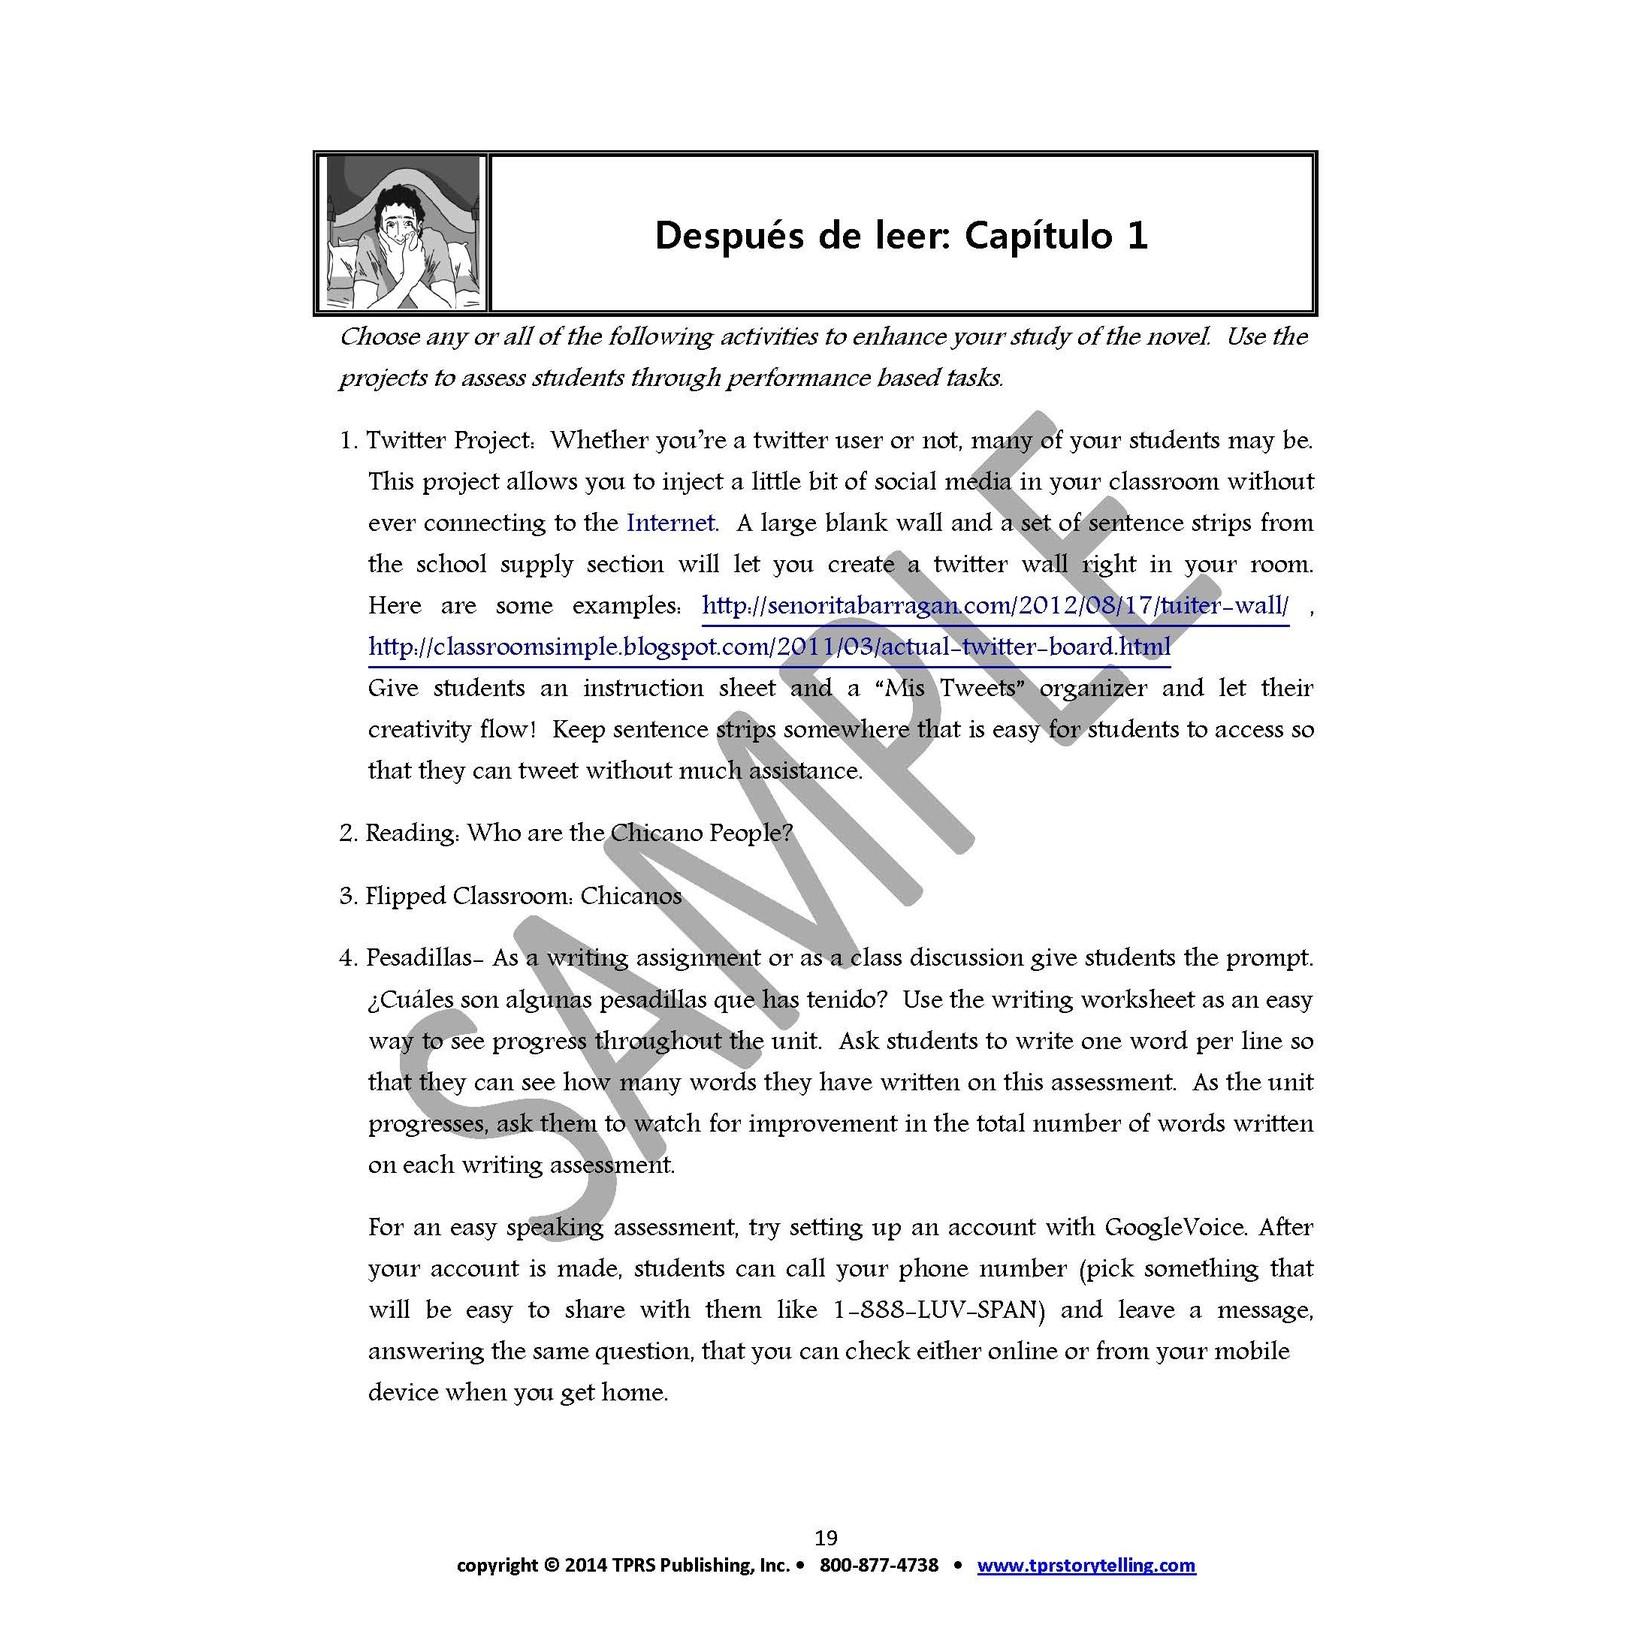 Fluency Matters La Calaca Alegre - Teacher's Guide on CD